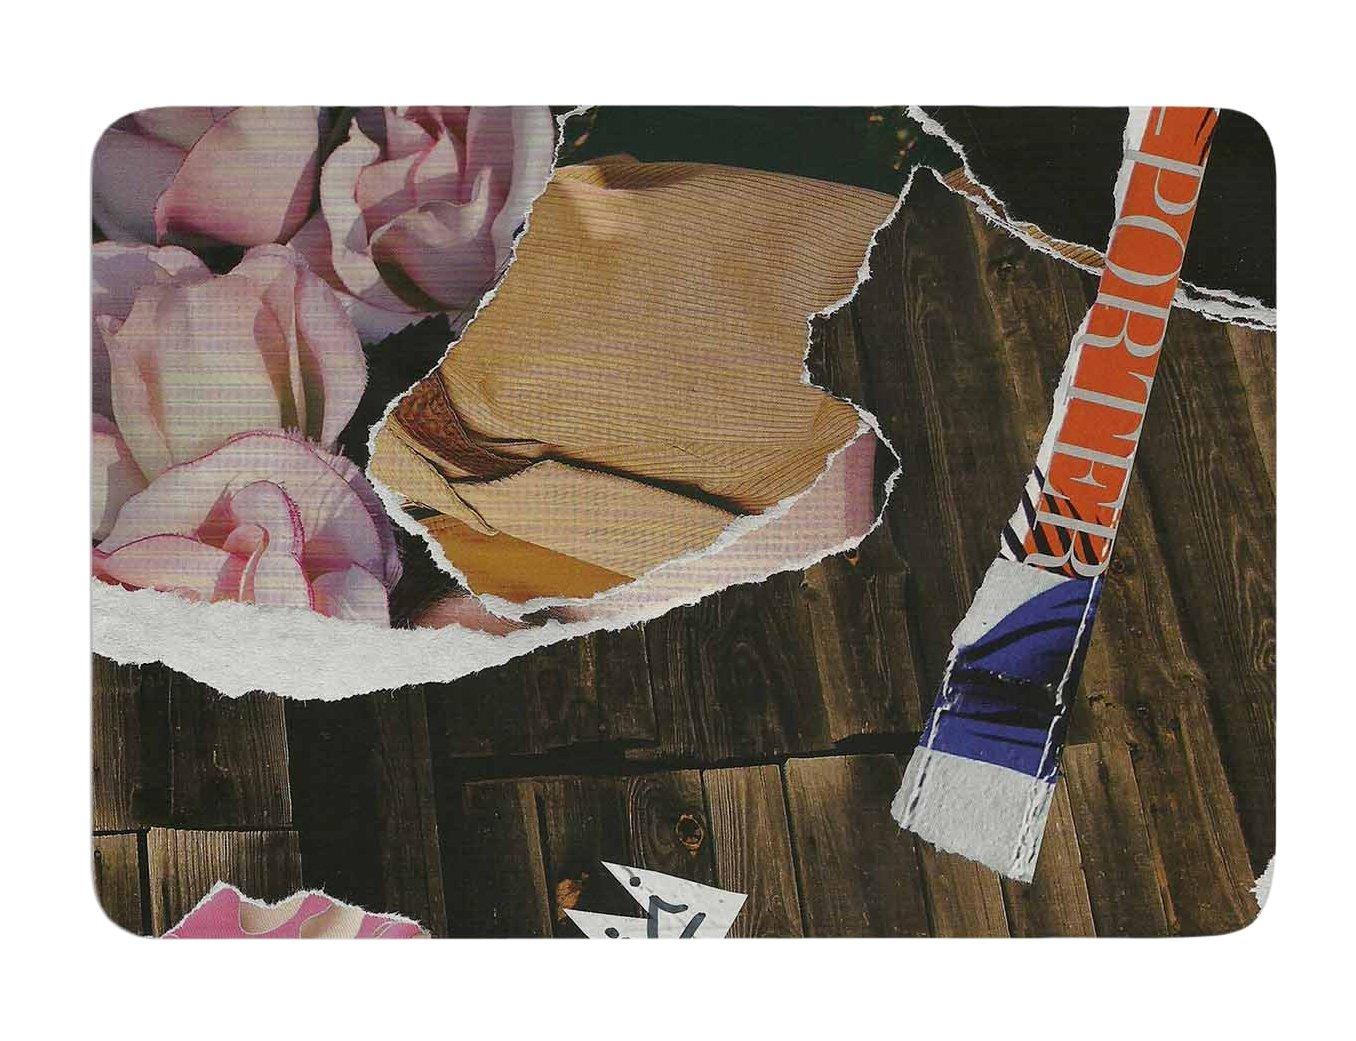 Kess InHouse Jina Ninjjaga Autumn Pop Art Memory Foam Bath Mat, 17 by 24-Inch, 17' X 24'